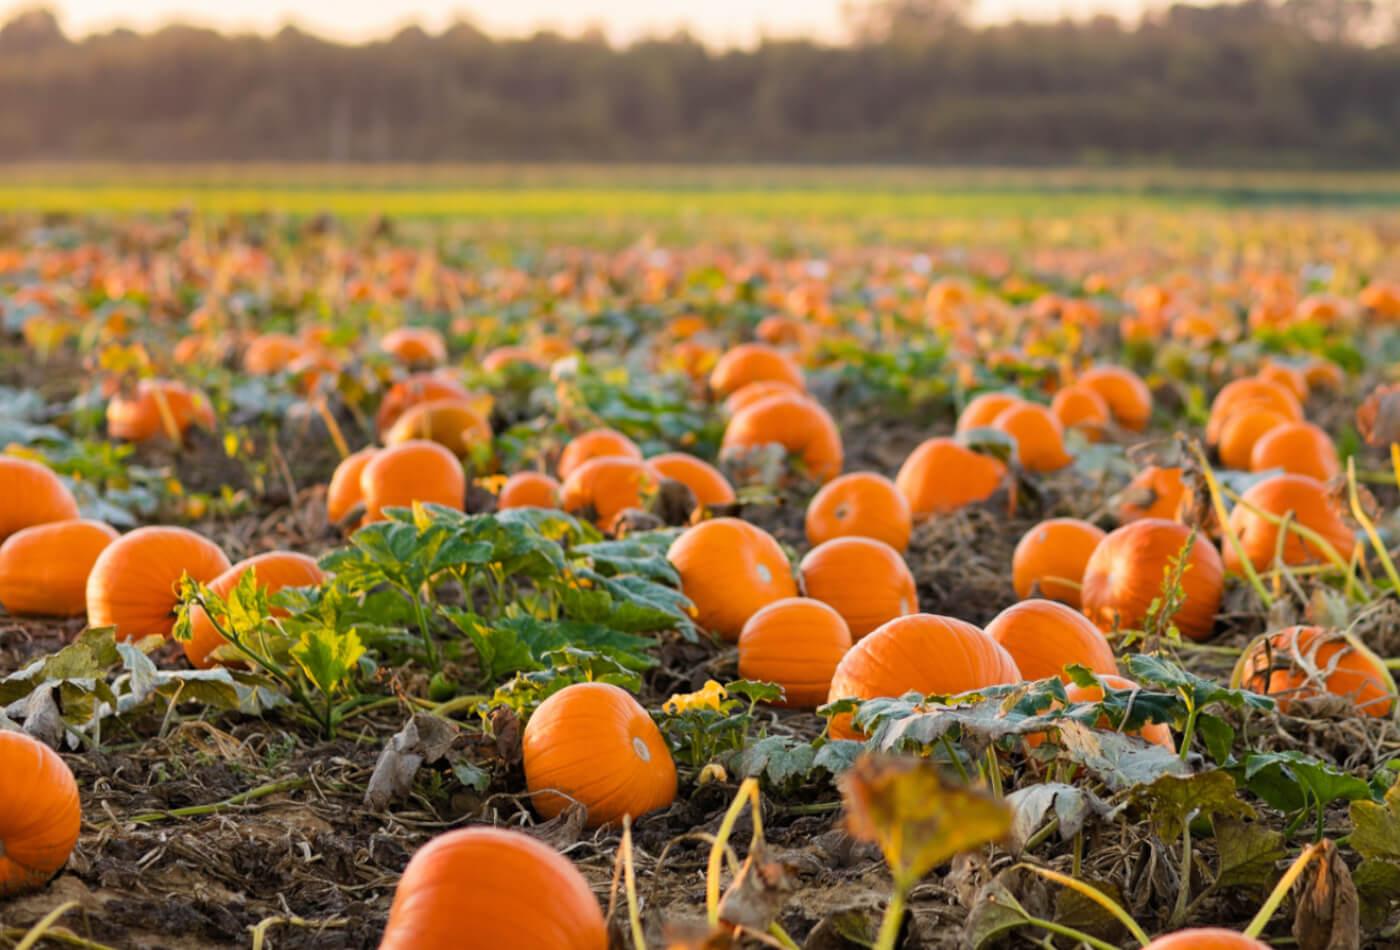 cornwall pumpkin patch